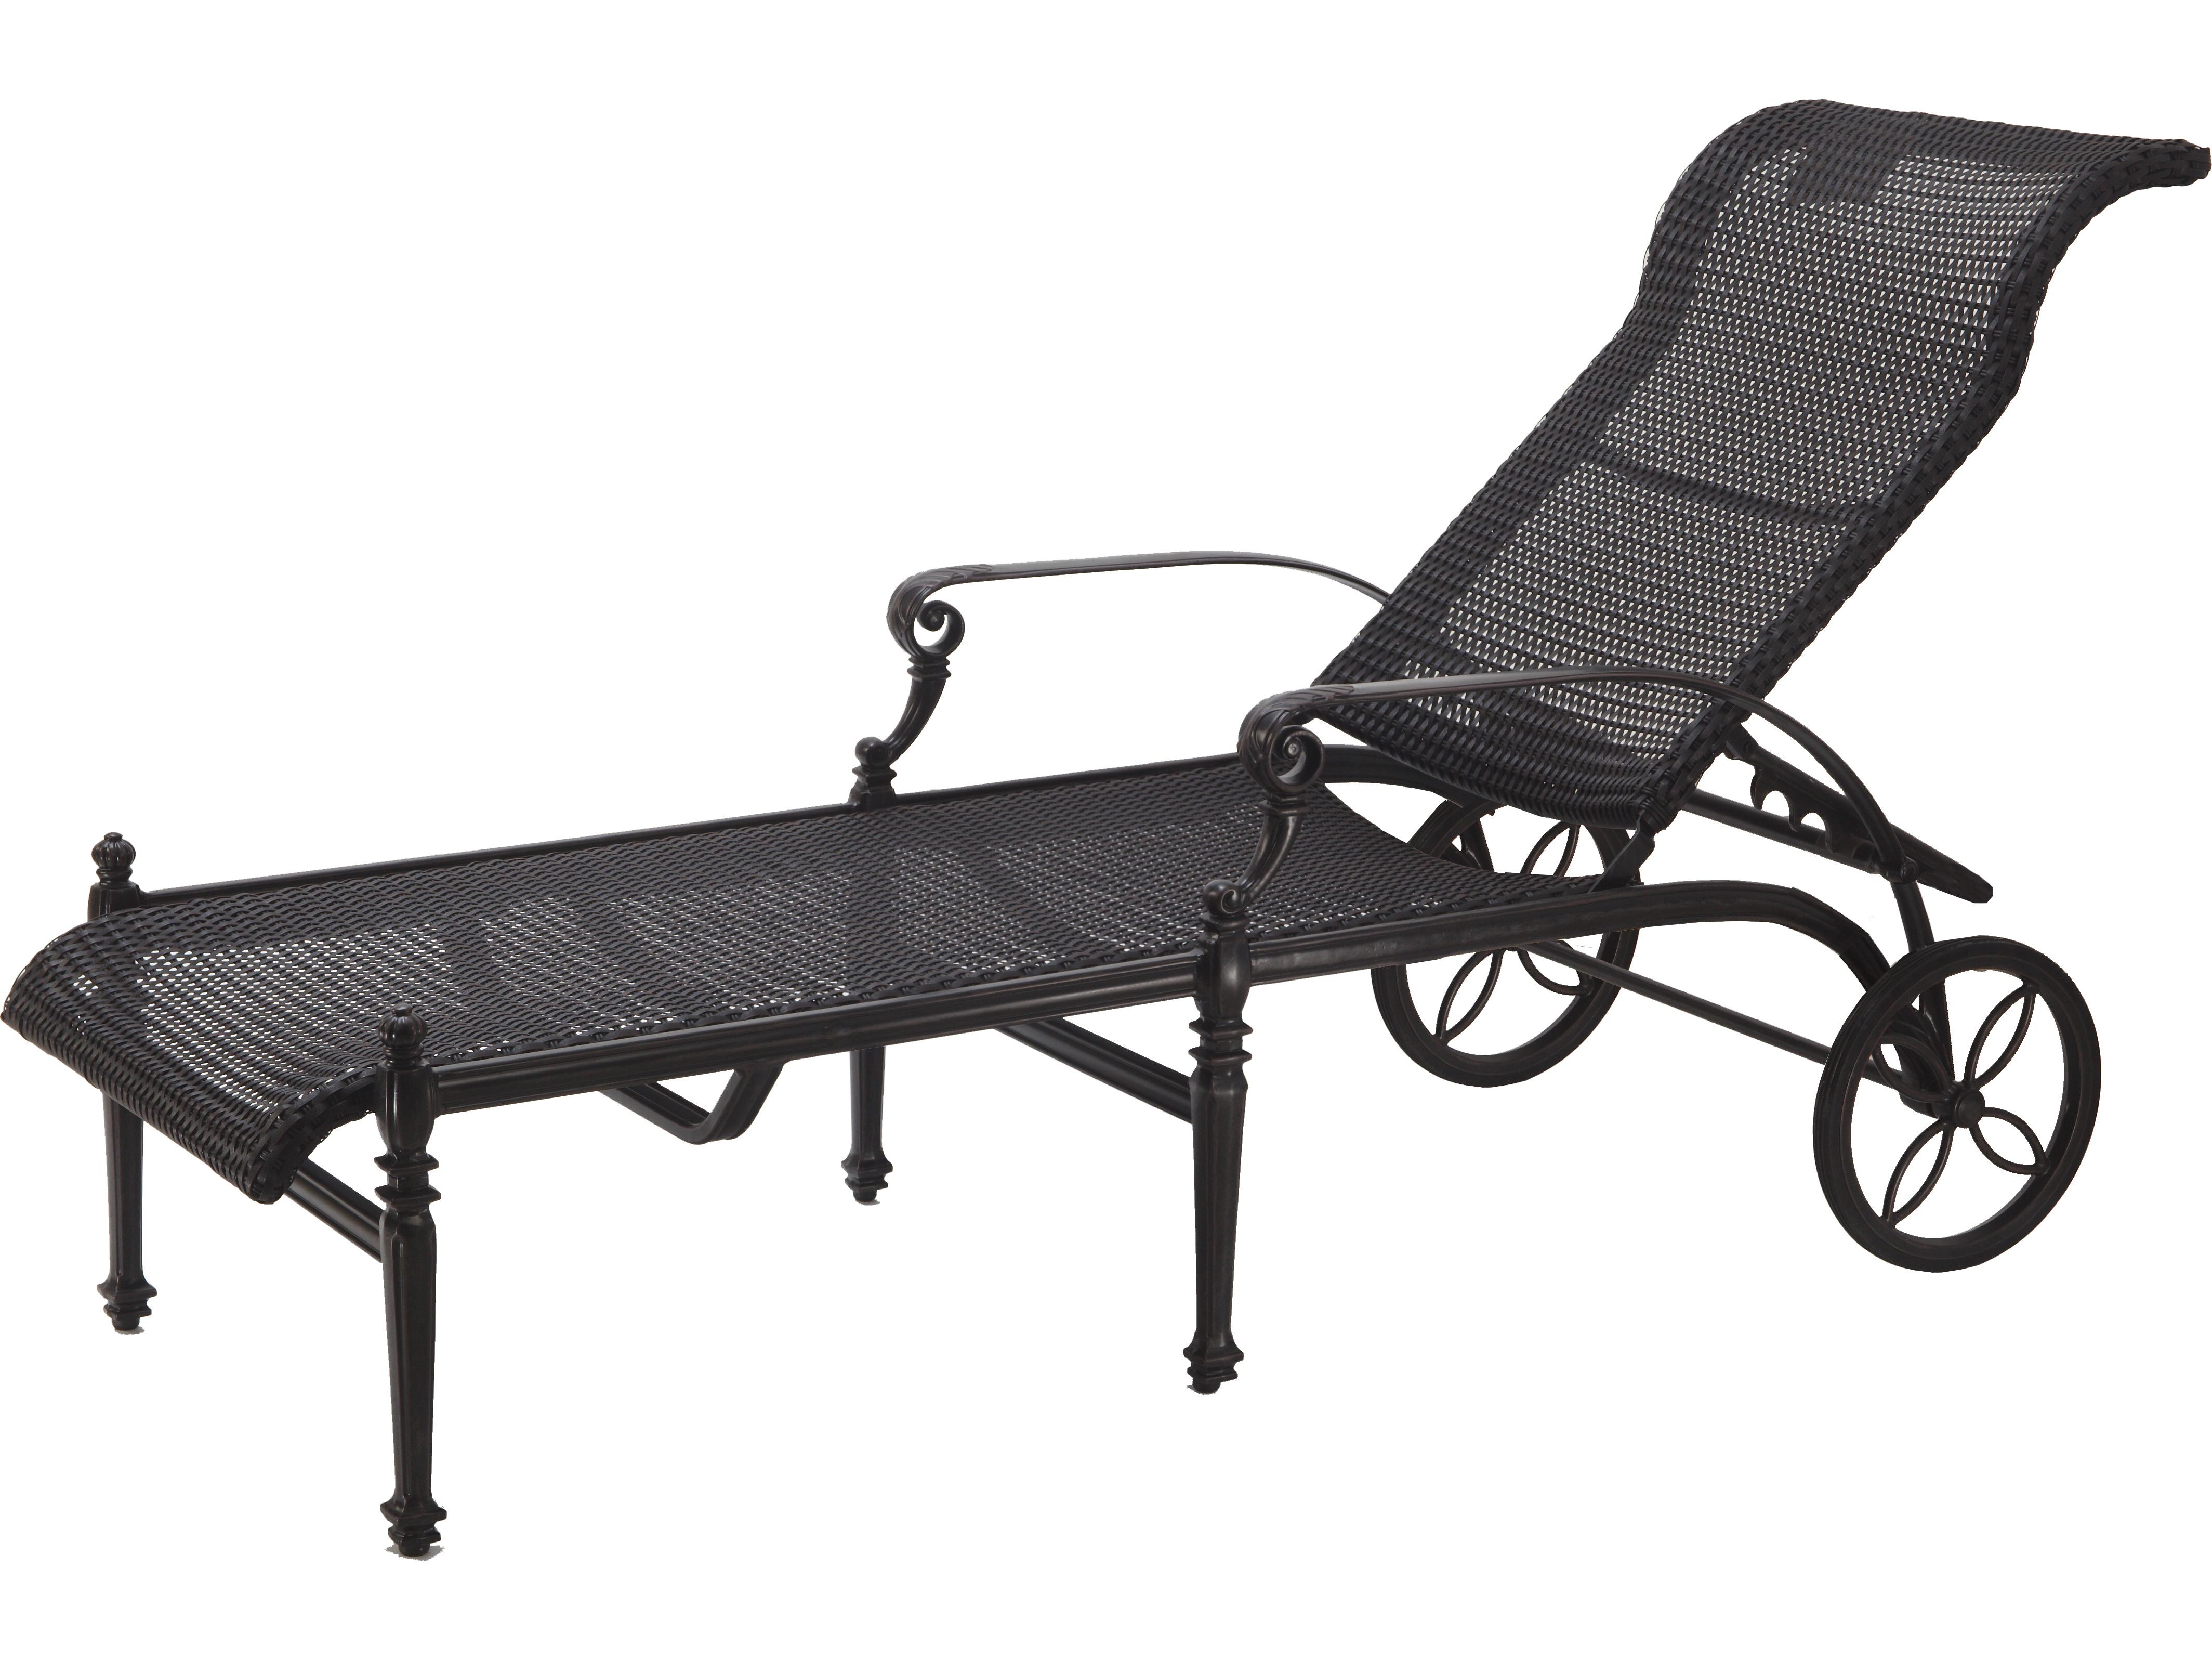 Gensun Grand Terrace Woven Cast Aluminum Chaise Lounge